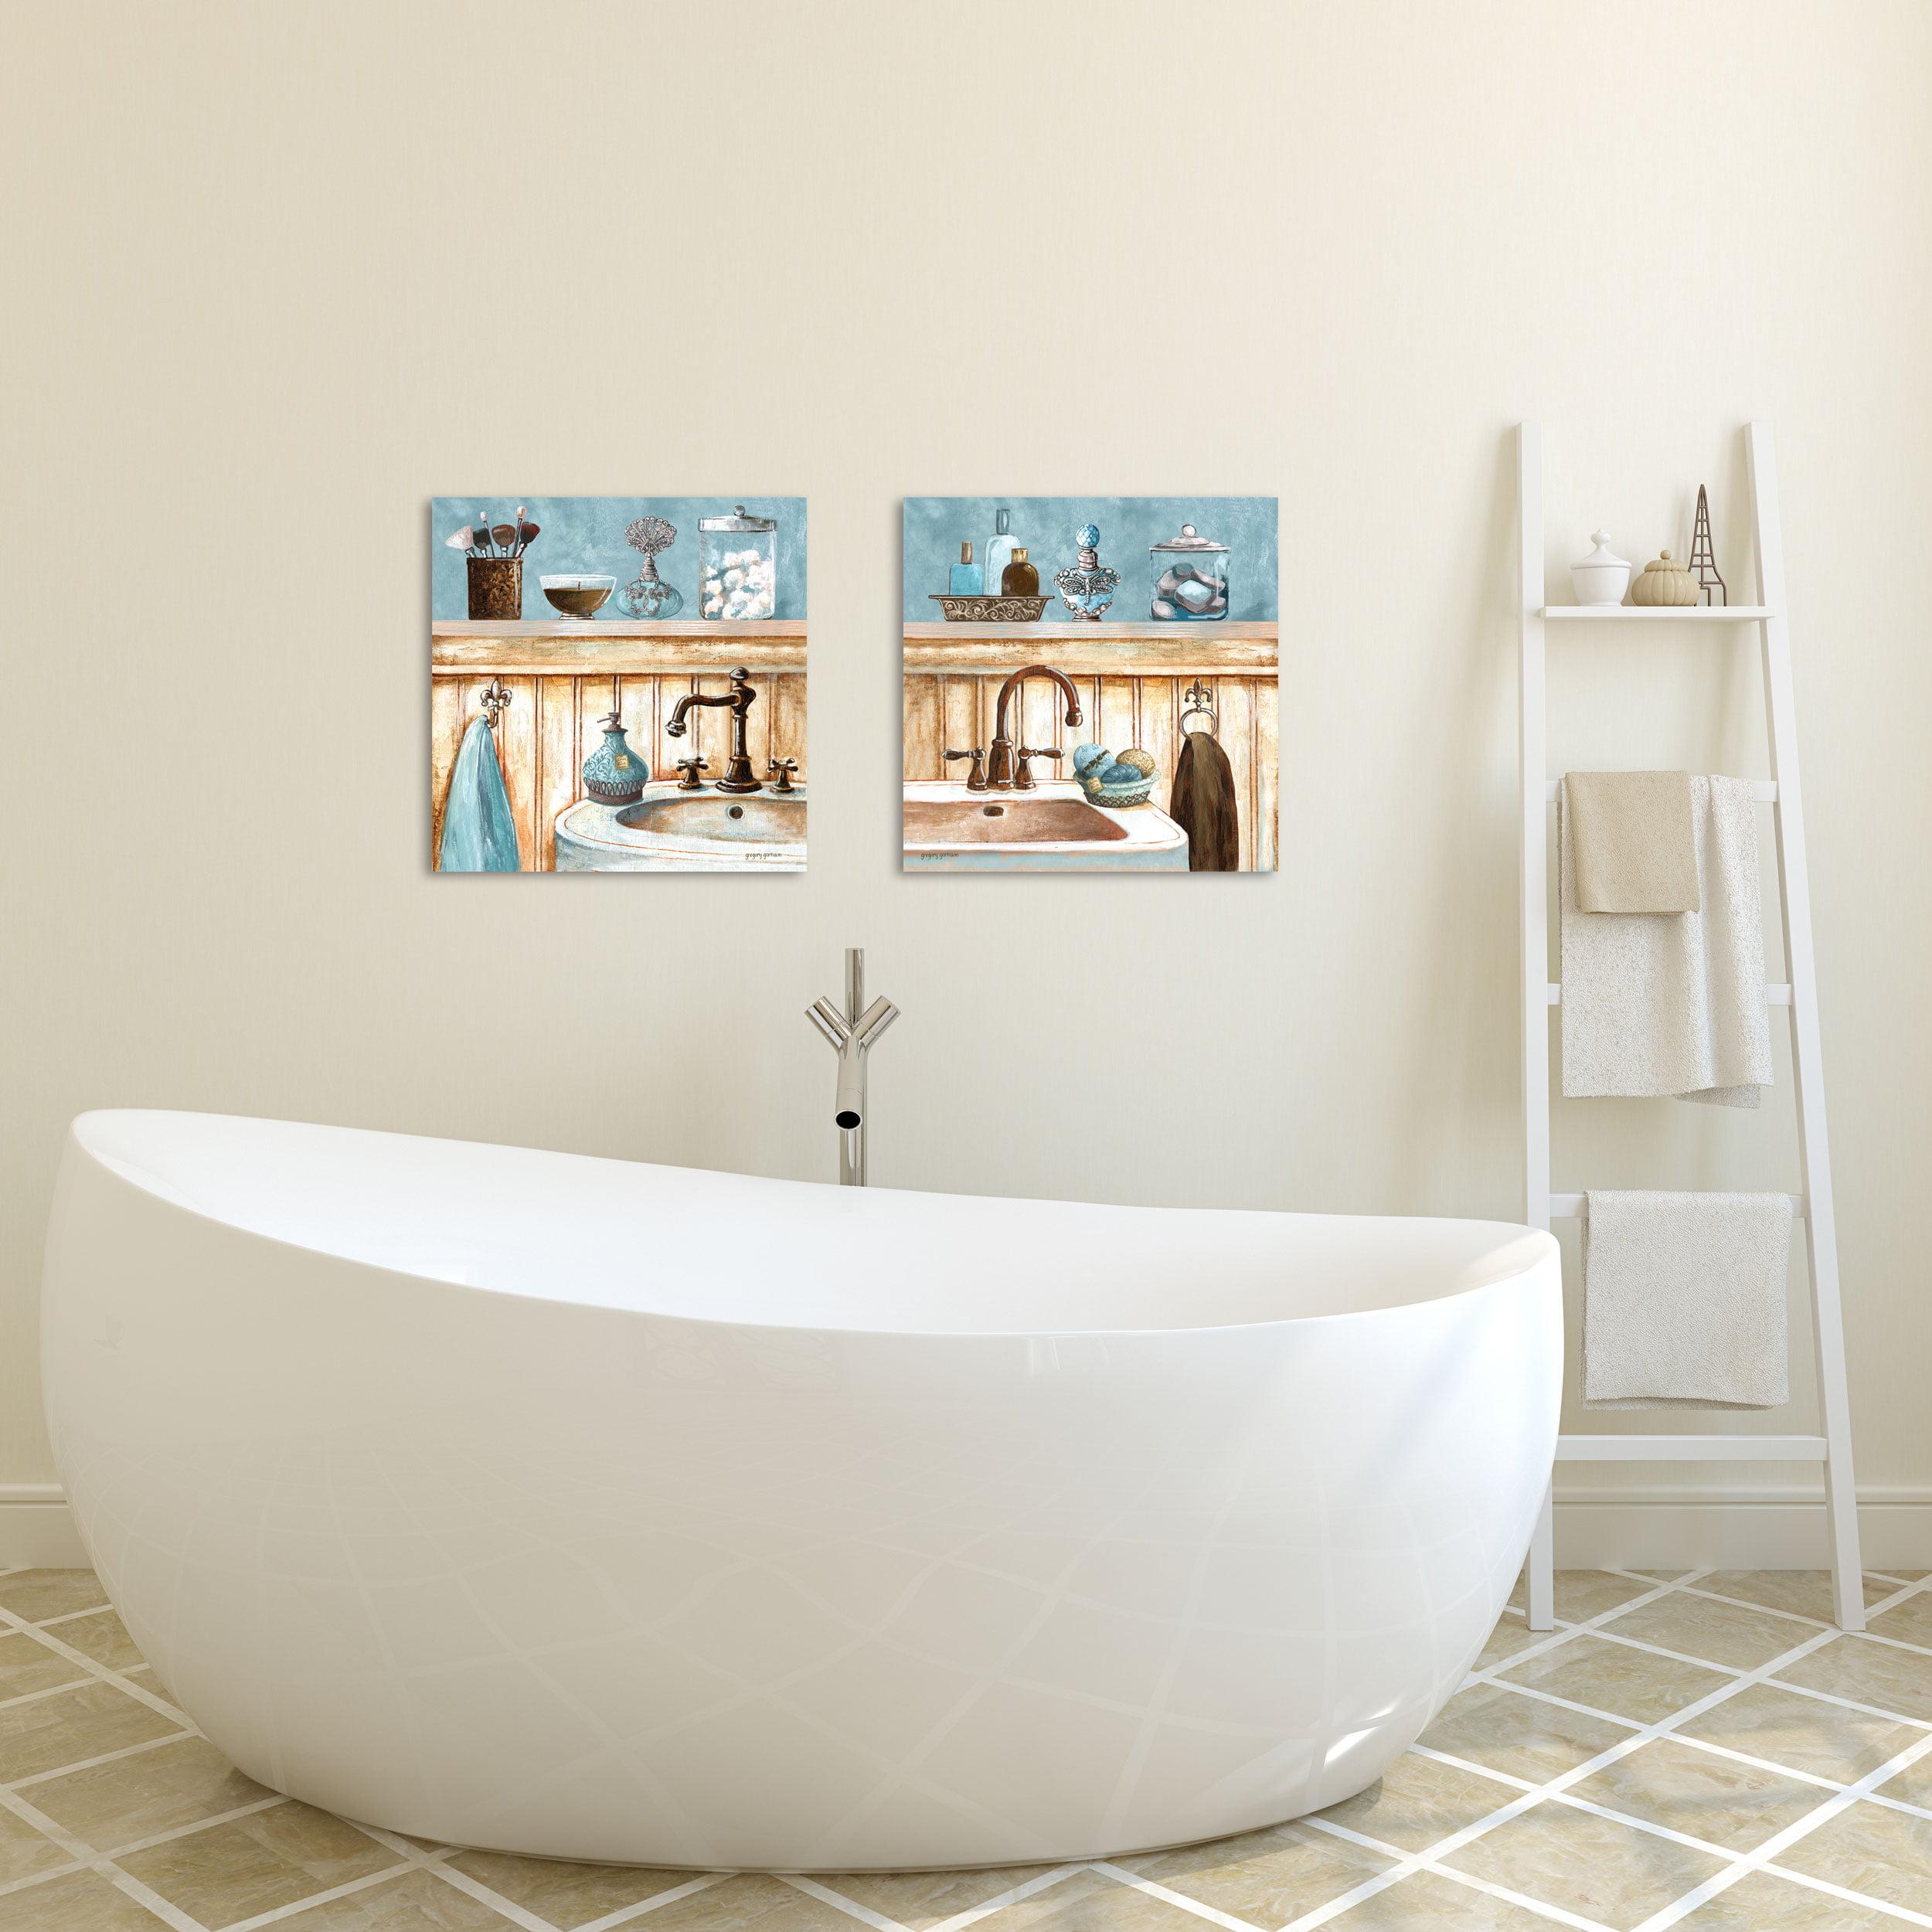 Gango Home Decor Classic Bathroom Wall Art Two Blue 12x12in Unframed Paper Prints Walmart Com Walmart Com